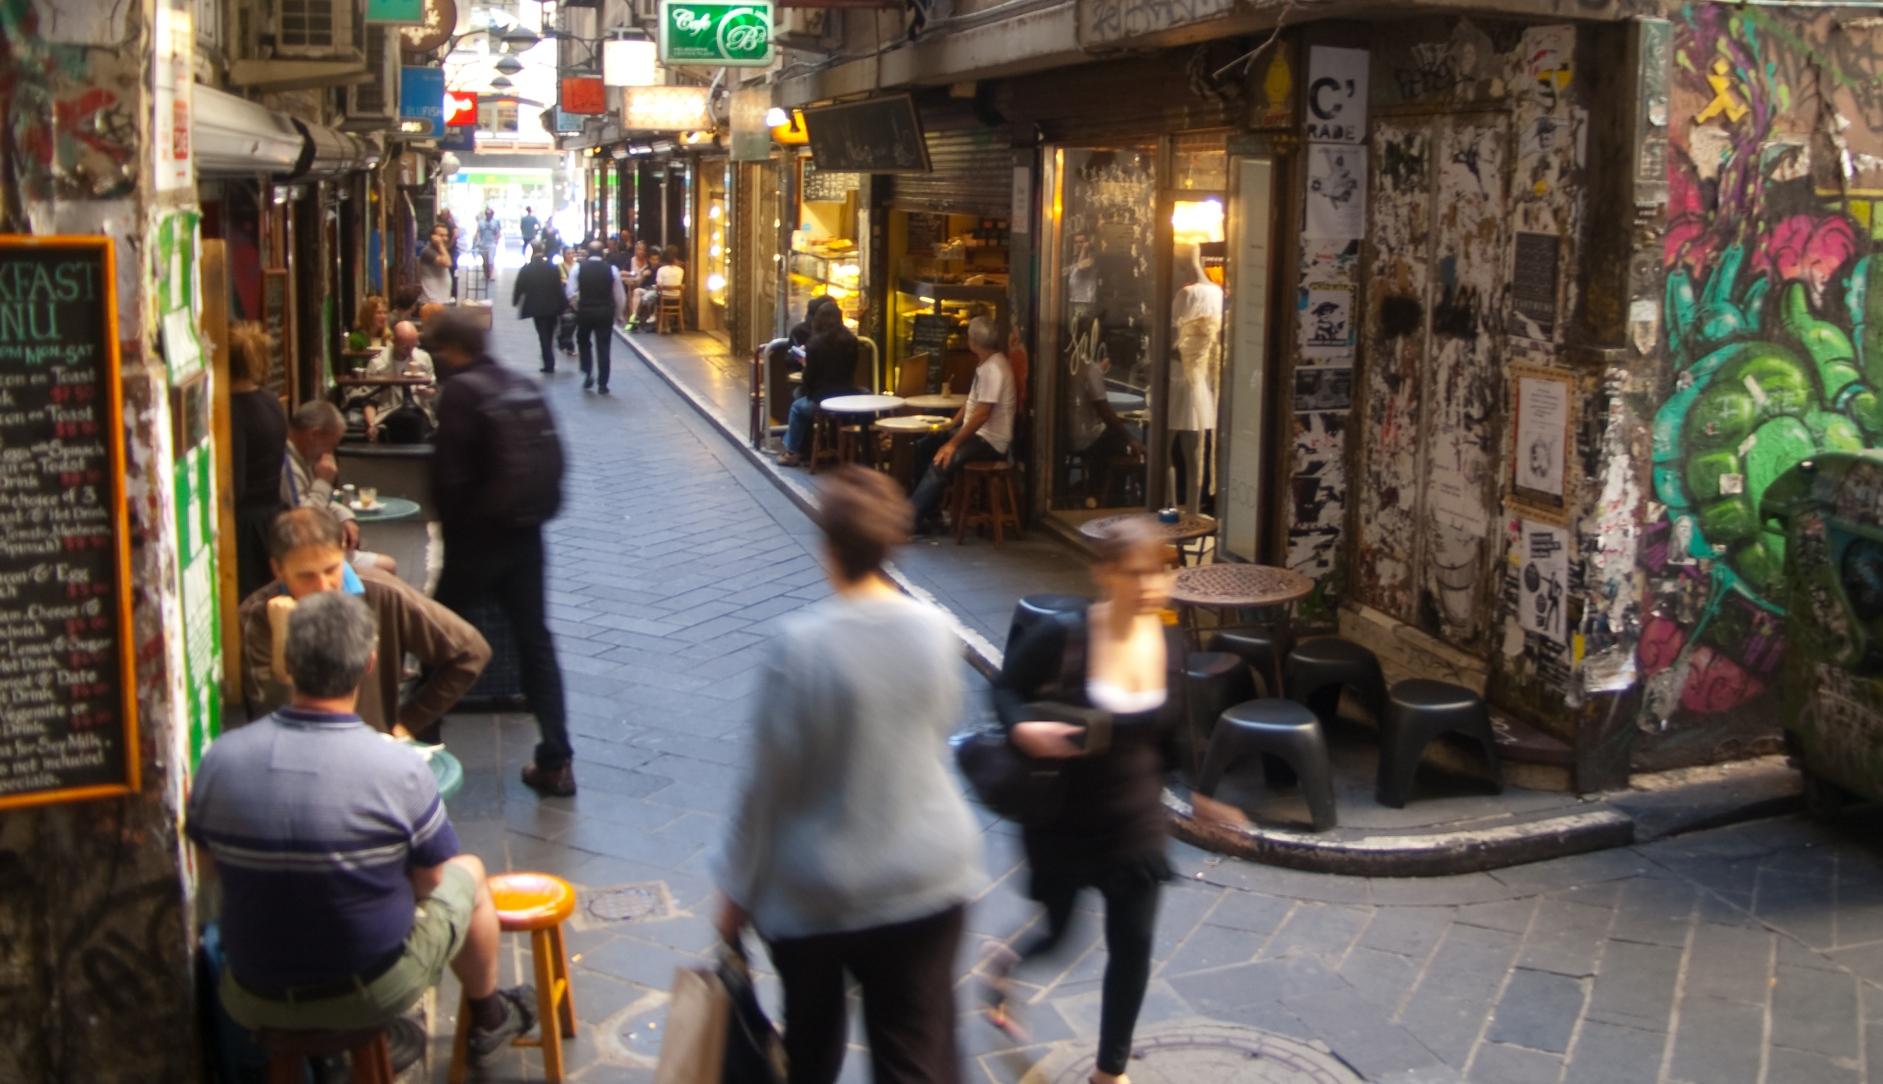 Melbourne's laneway cafe culture is bustling!